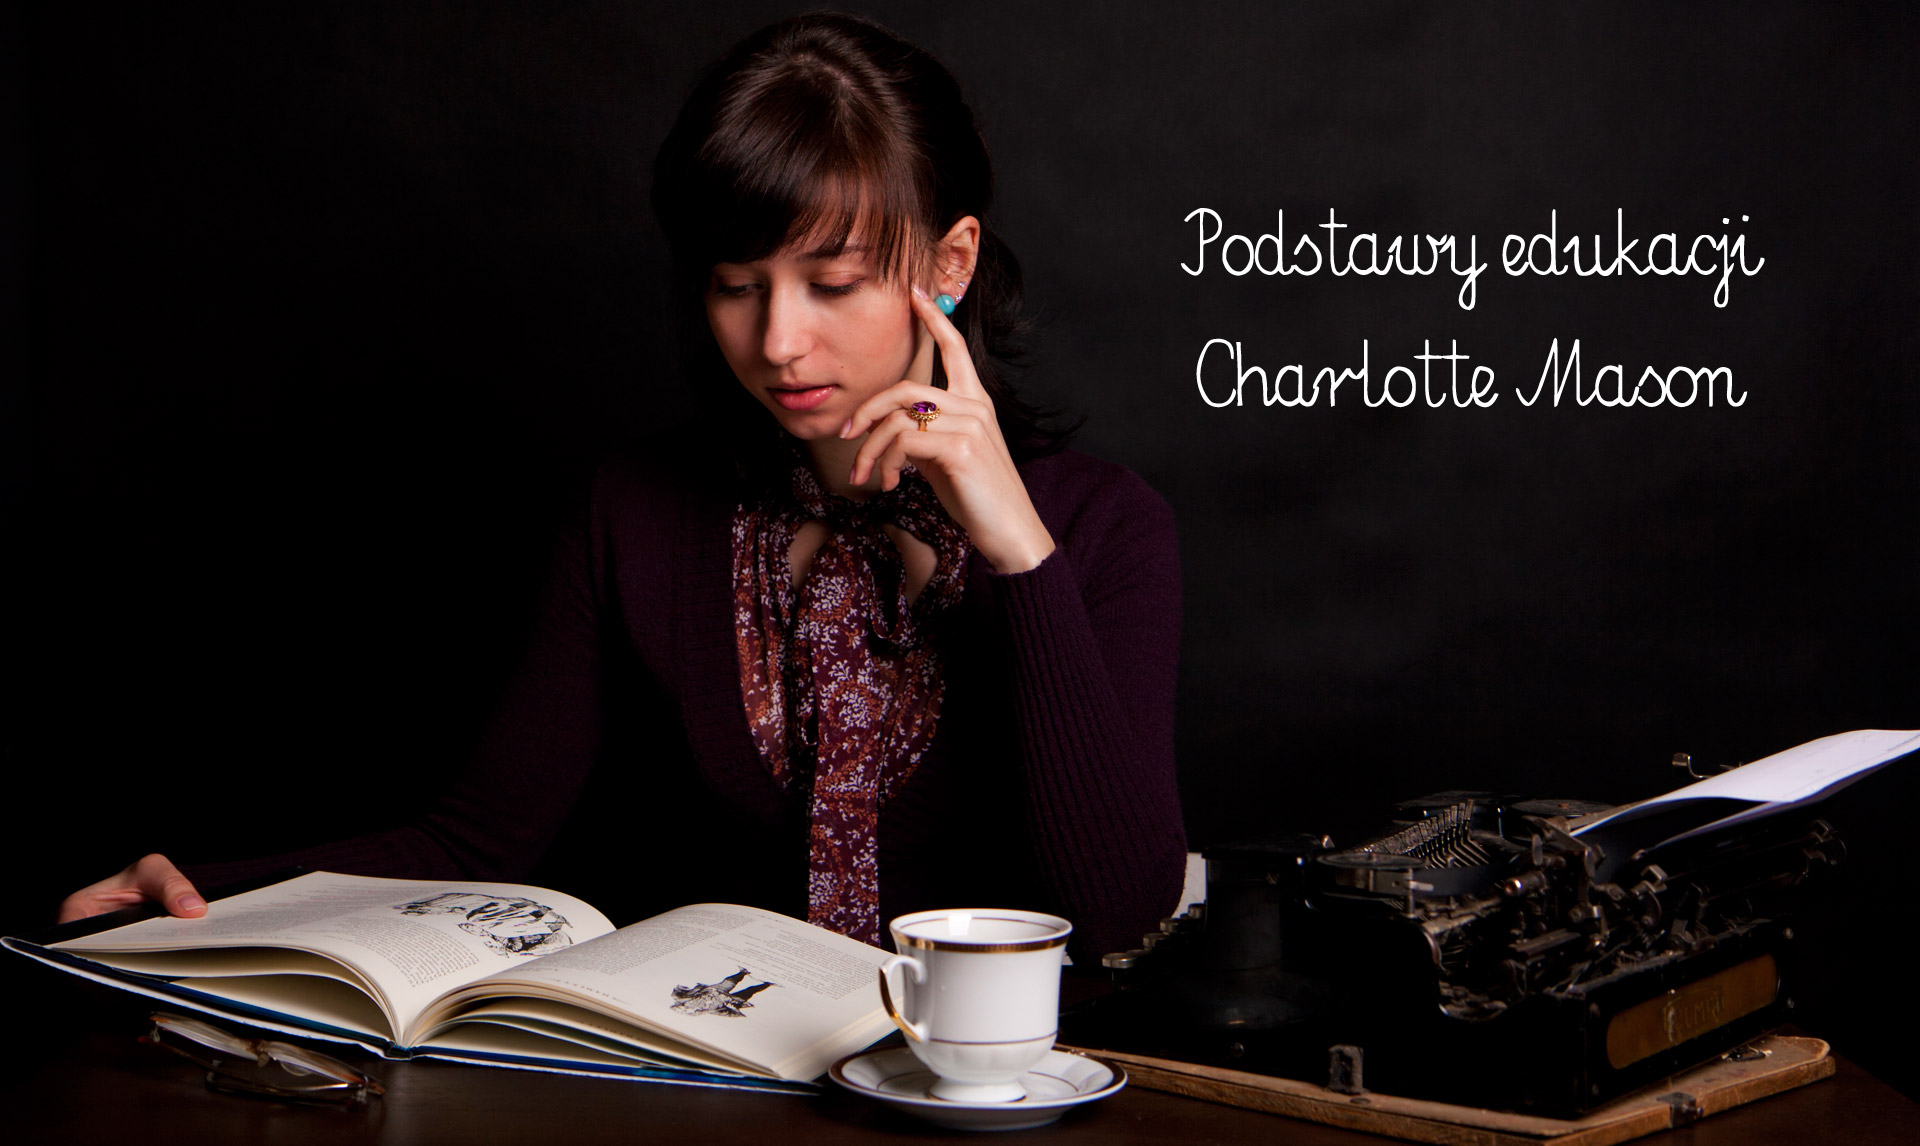 charlotte mason, edukacja alternatywna